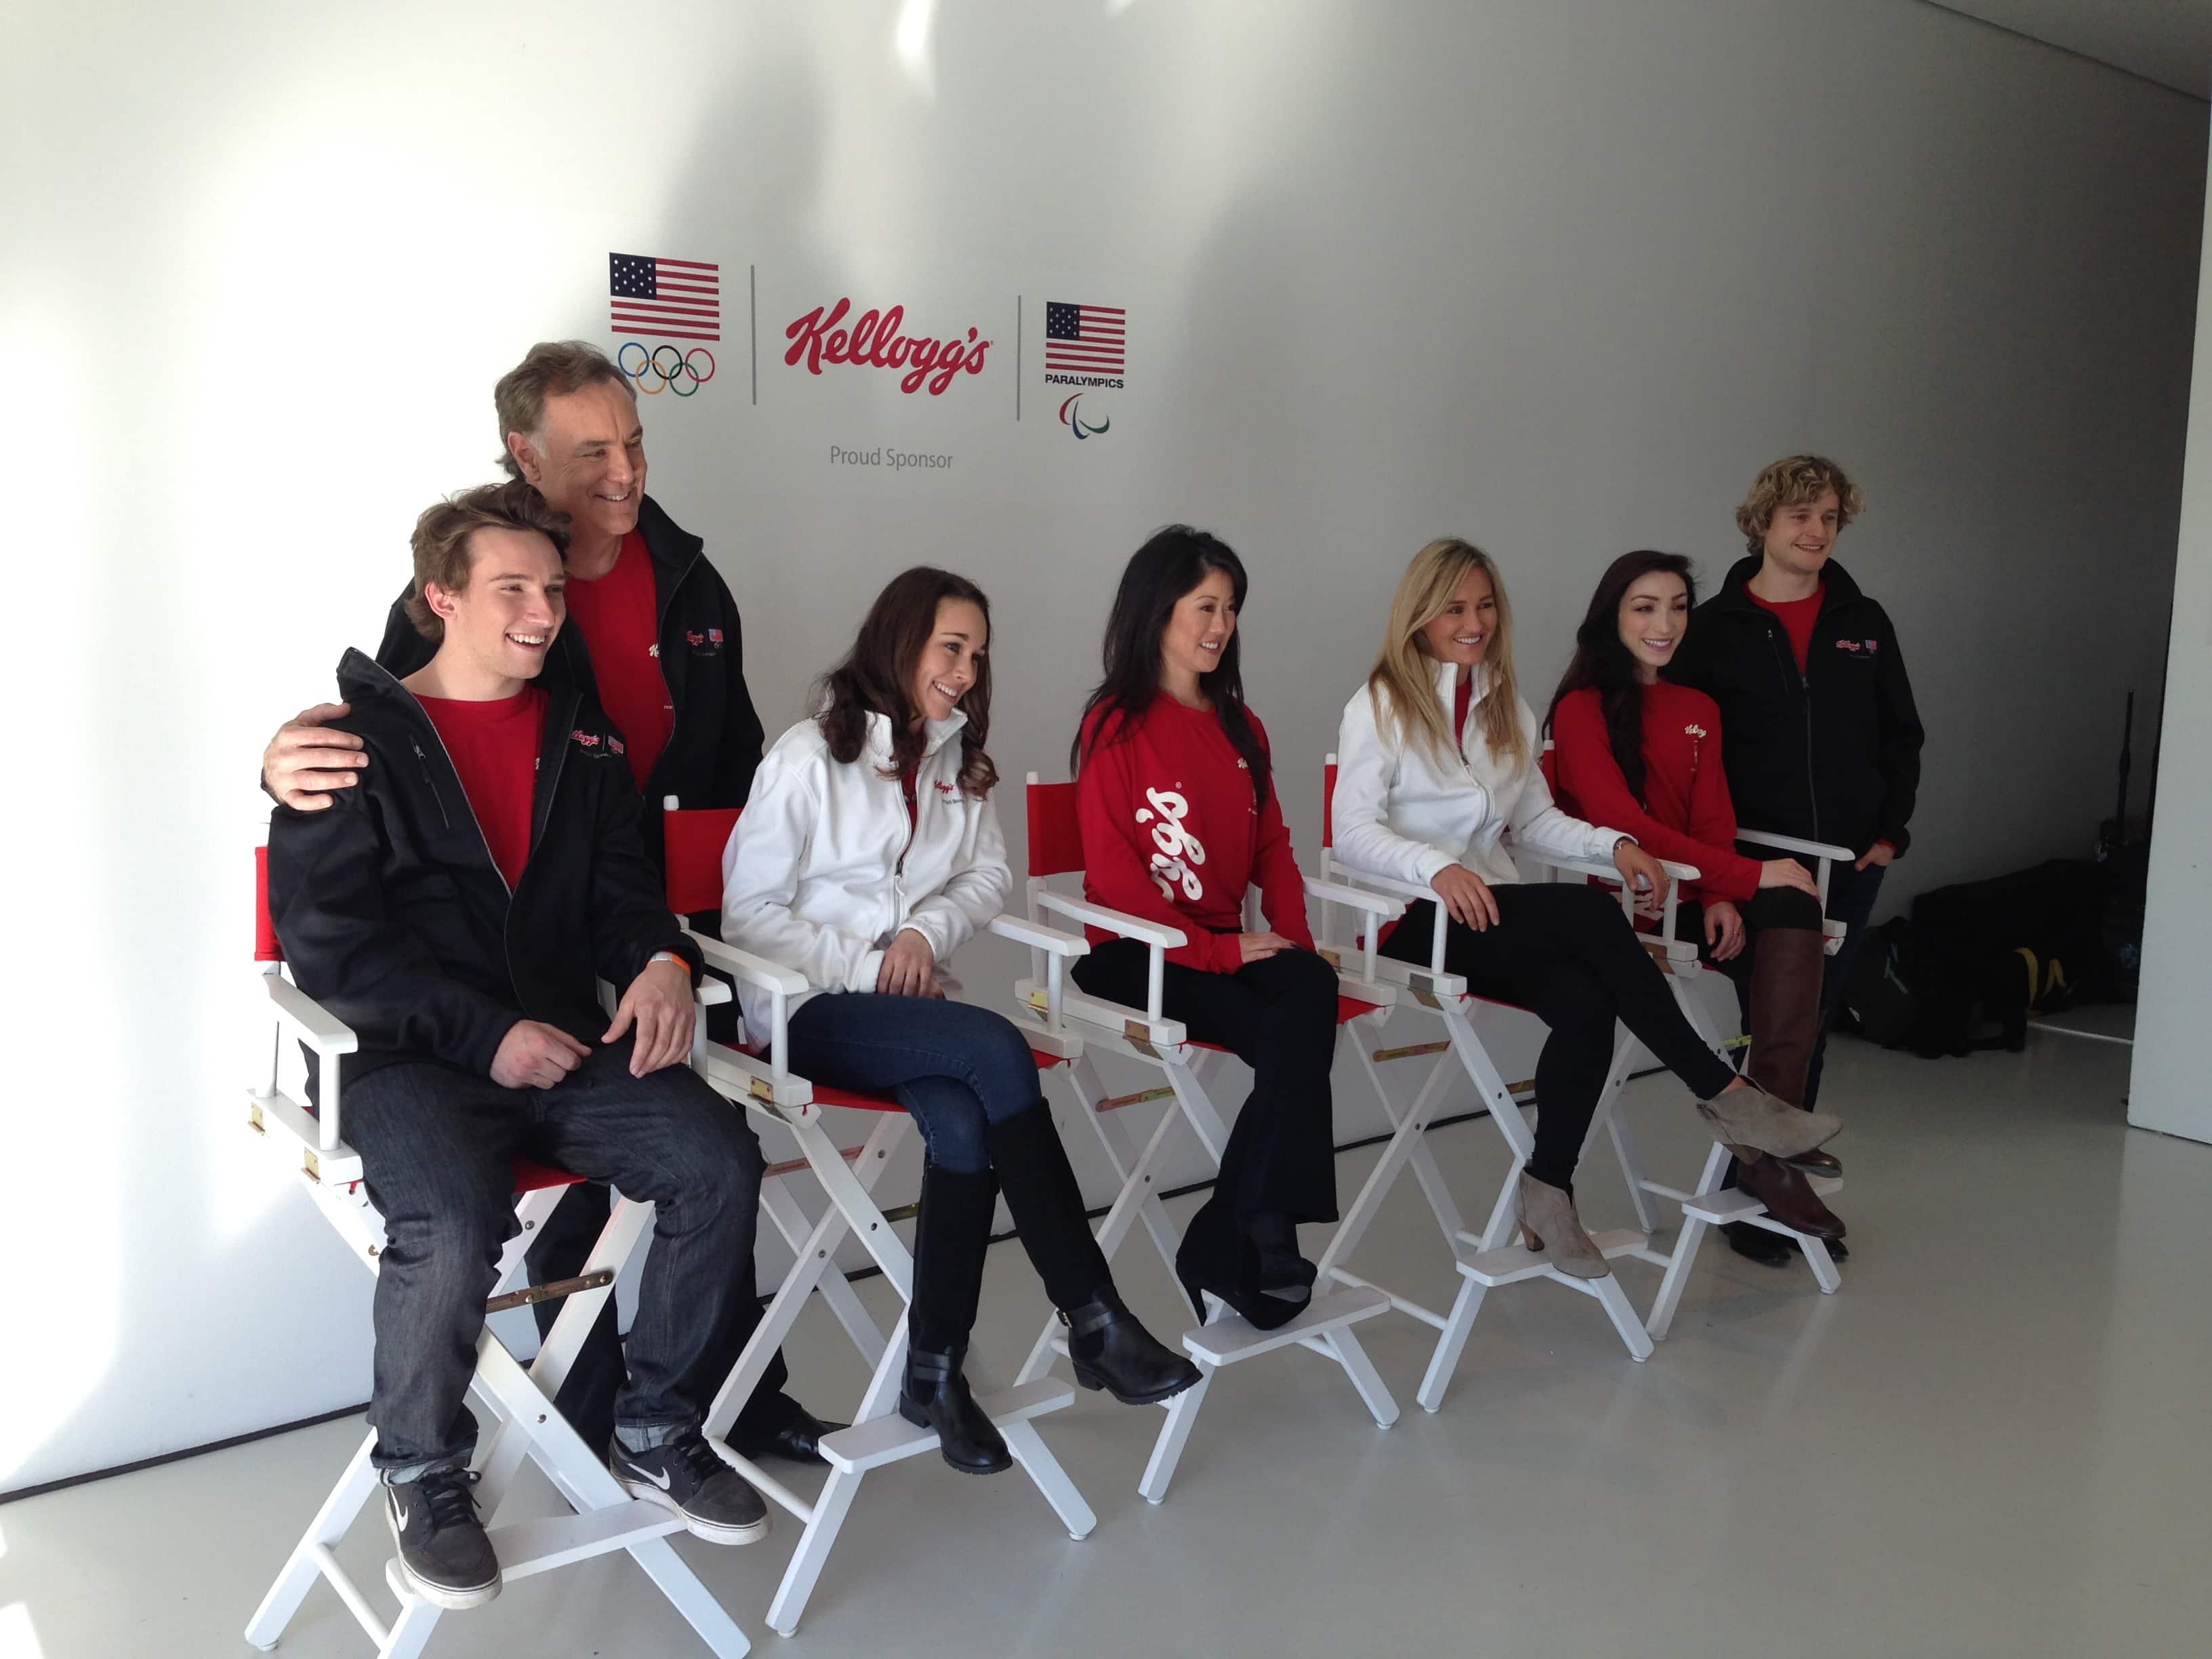 Kellogg's Great Start Olympic Athletes